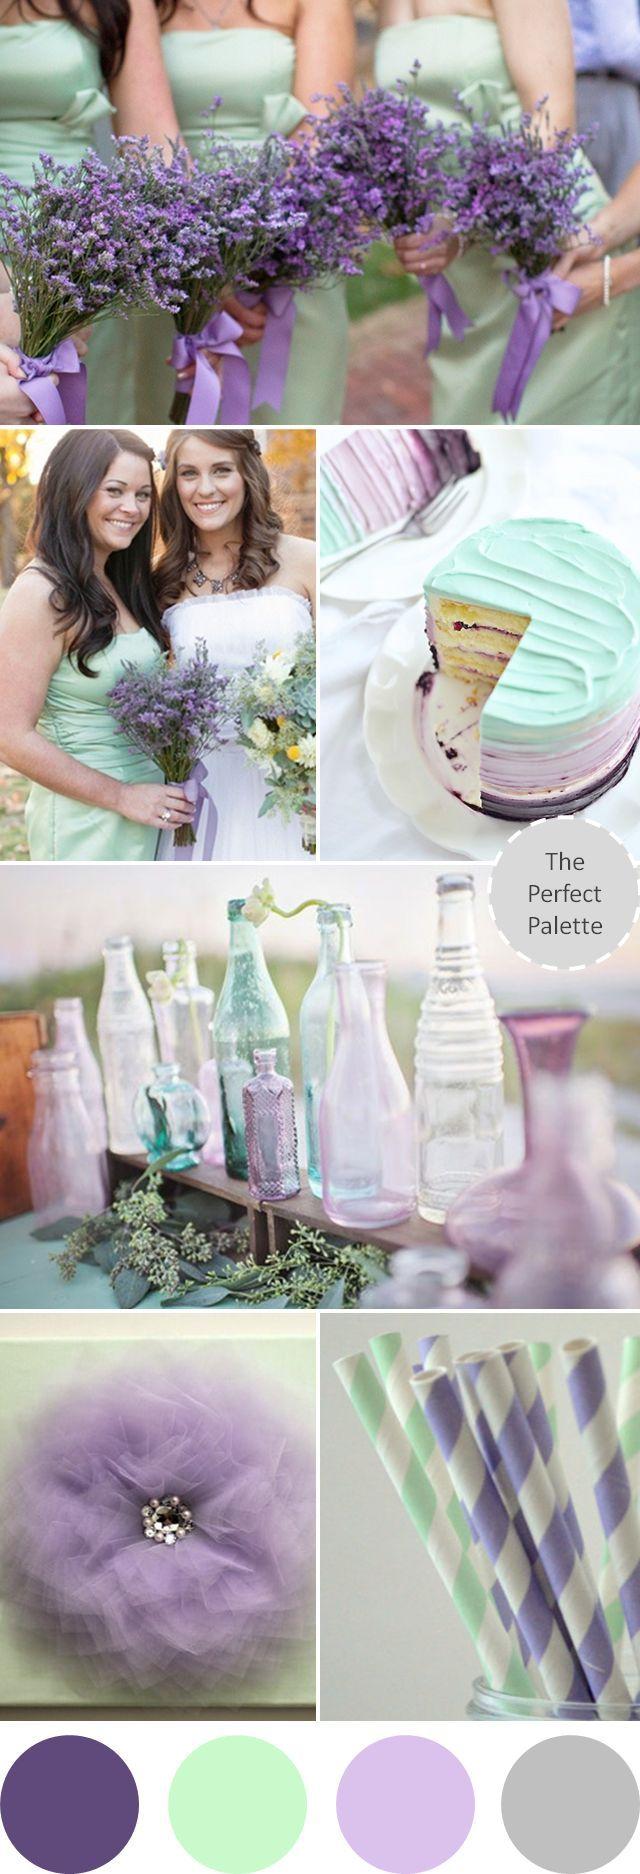 Wedding Colors | Lavender & Mint http://www.theperfectpalette.com/2013/09/wedding-colors-lavender-mint.html